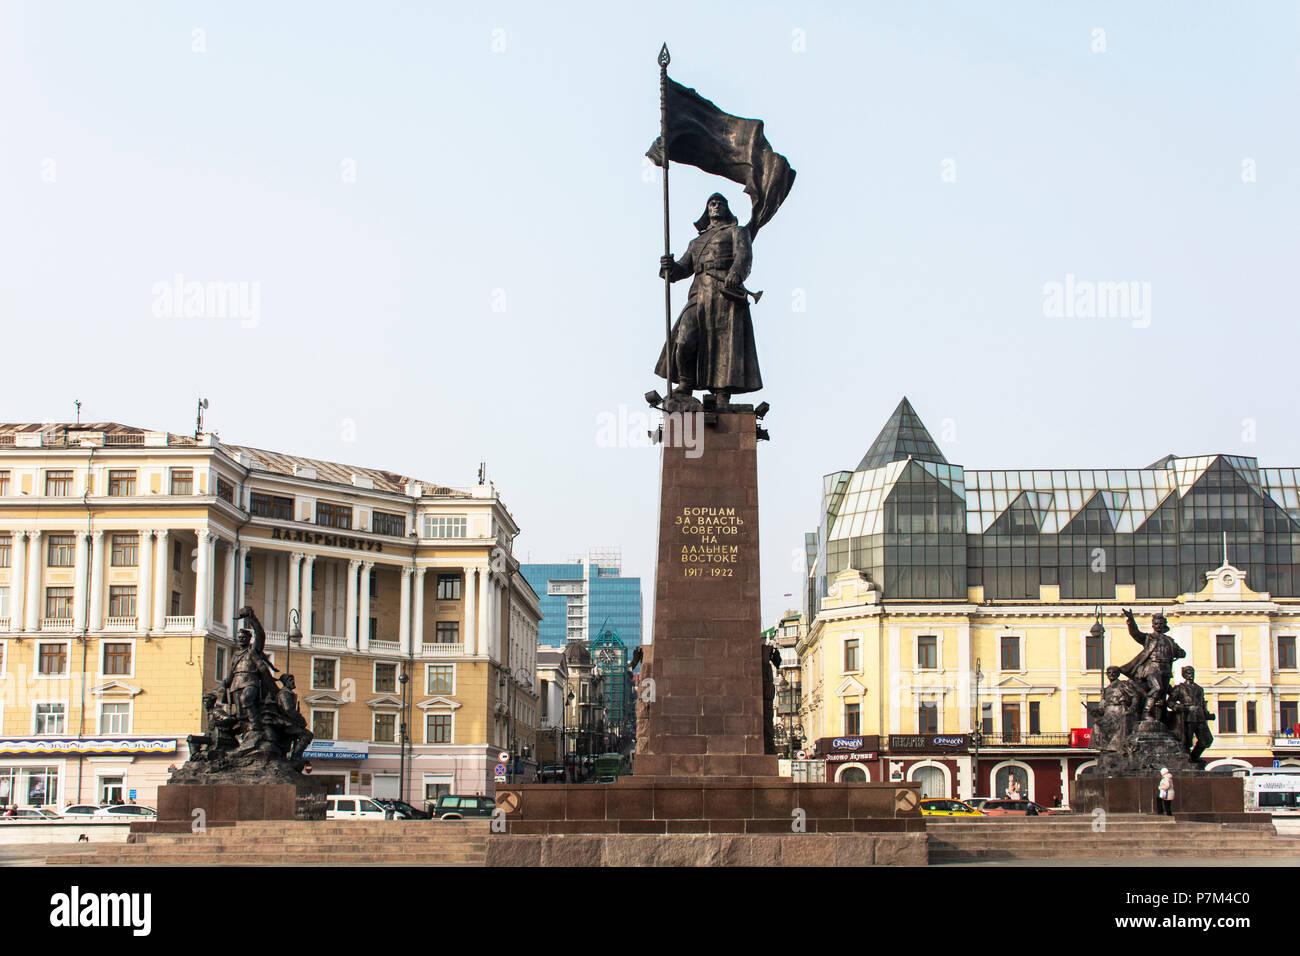 Central square of Vladivostok in Russia - Stock Image